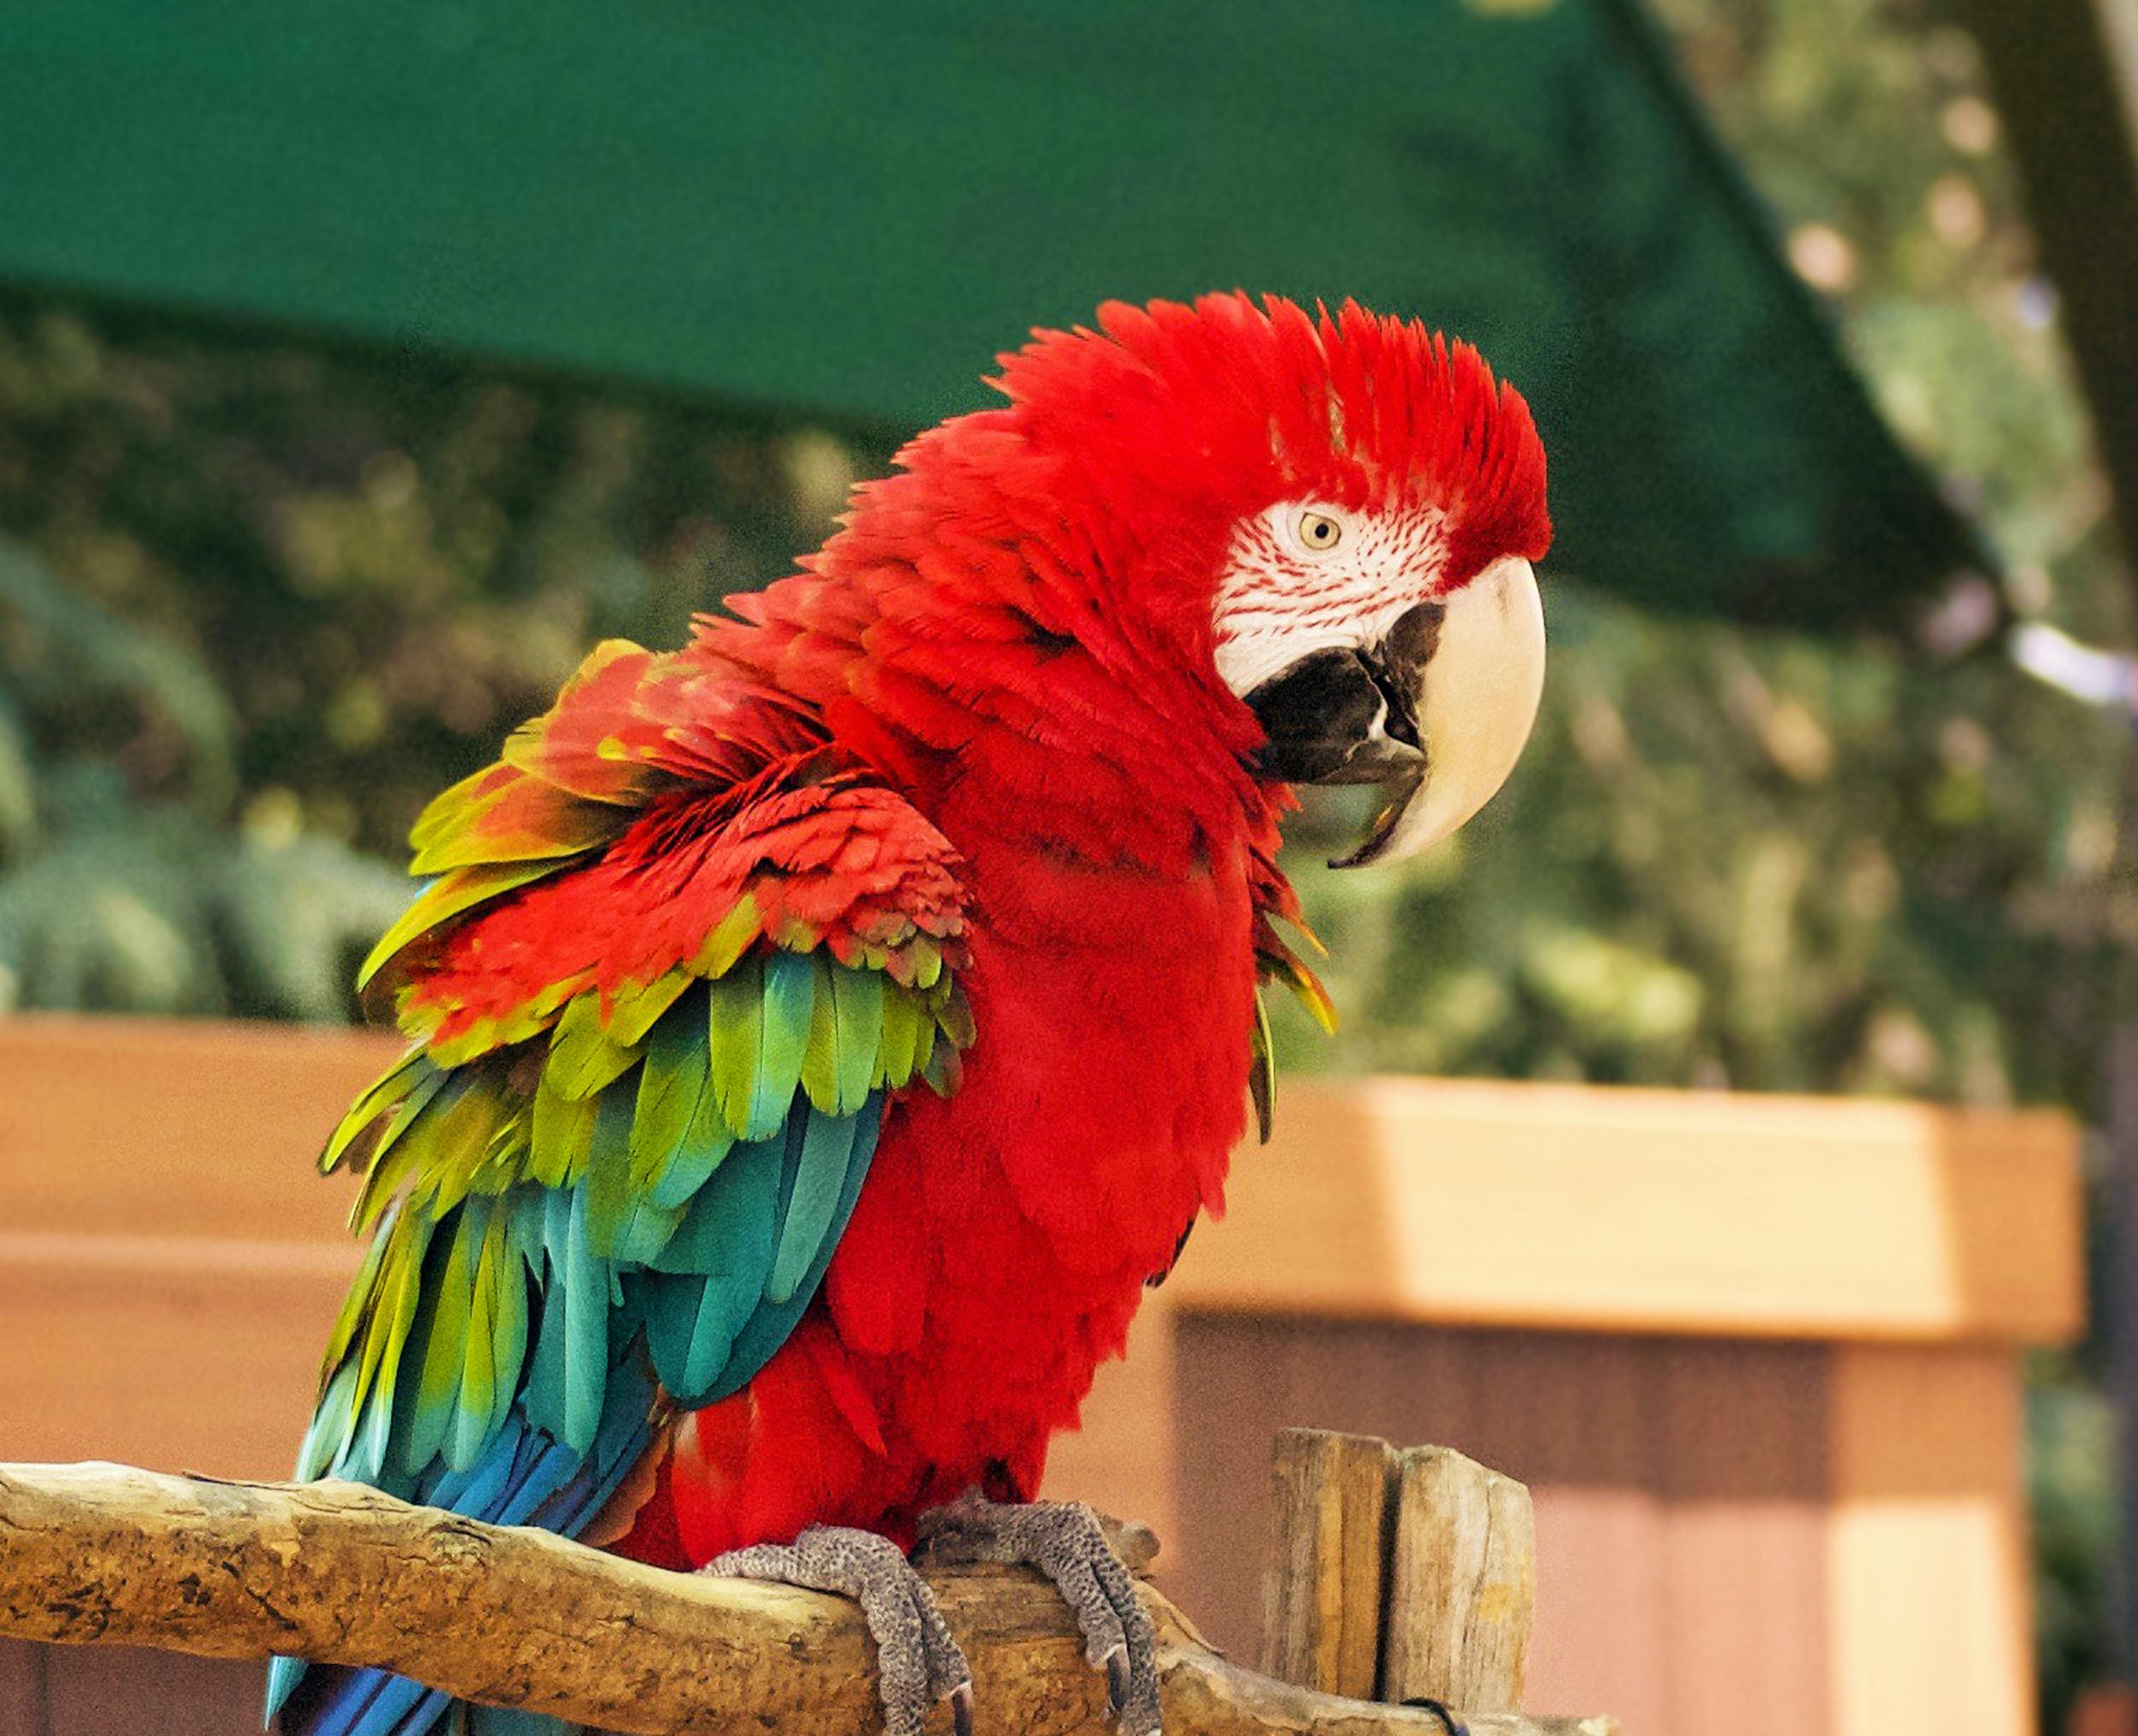 Green Winged Macaw at the Virignia Zoo